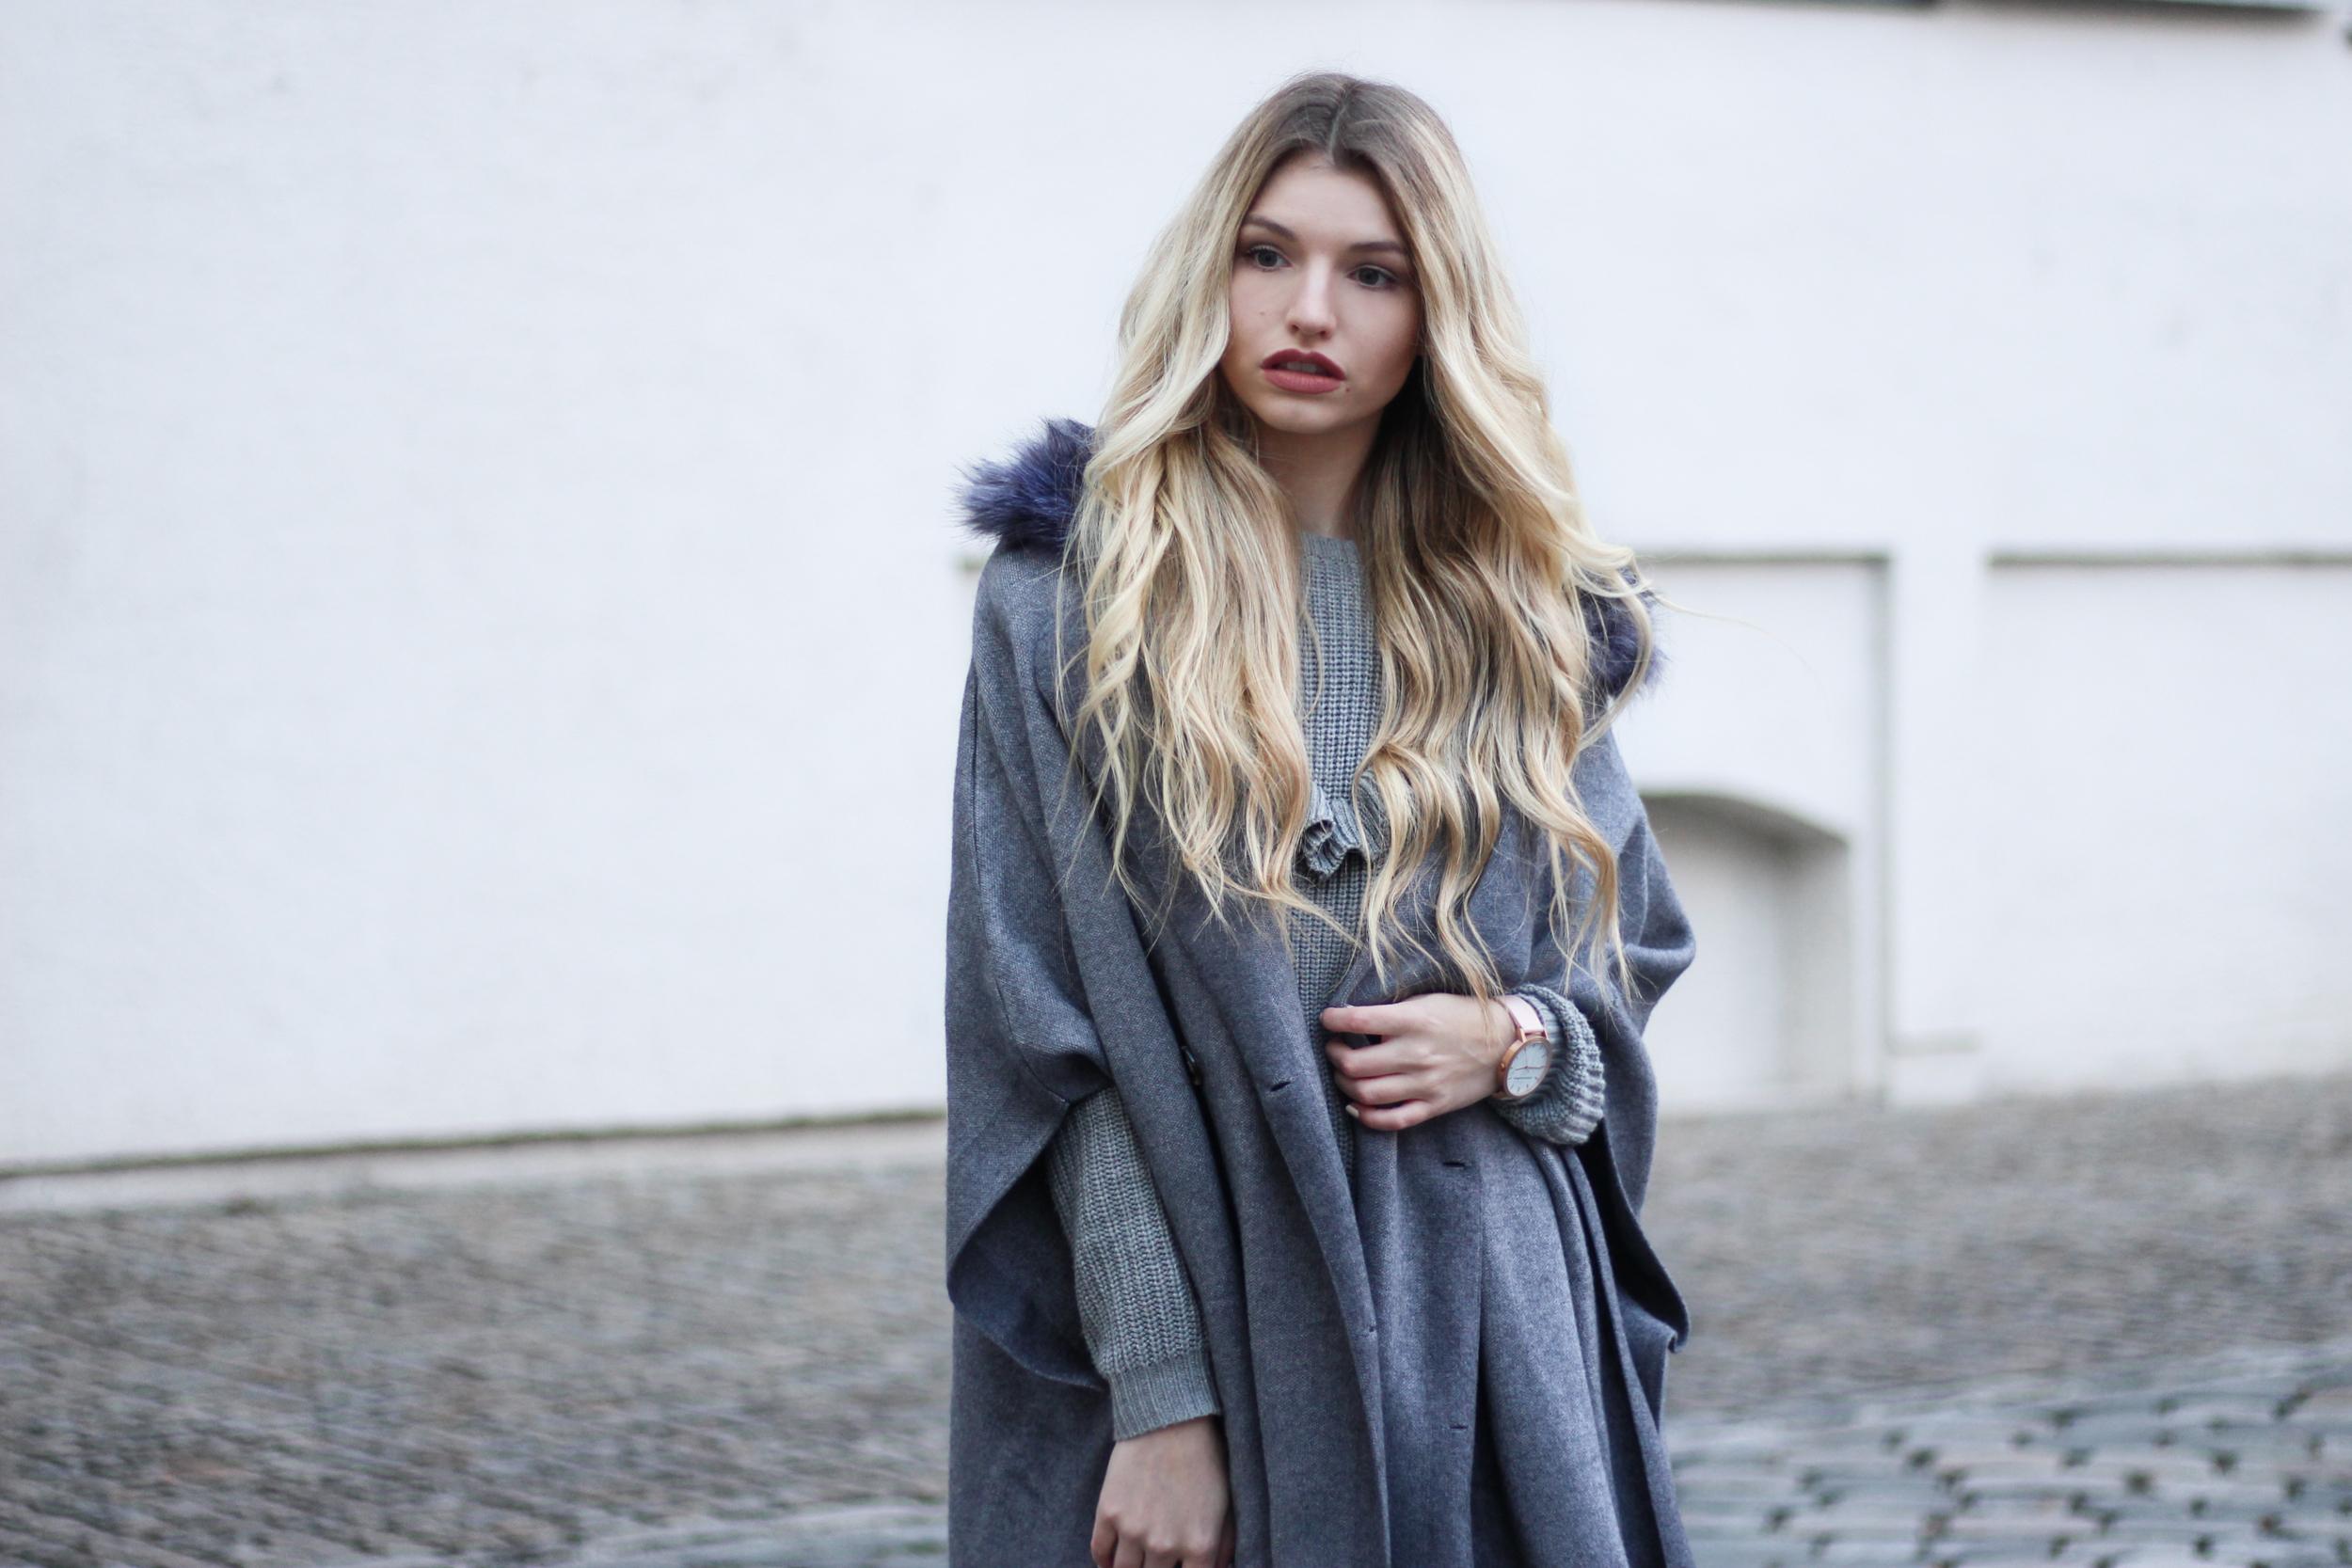 Aus München Outfit Winter Blogger Franziska Elea Fashionblog vnN8m0wO